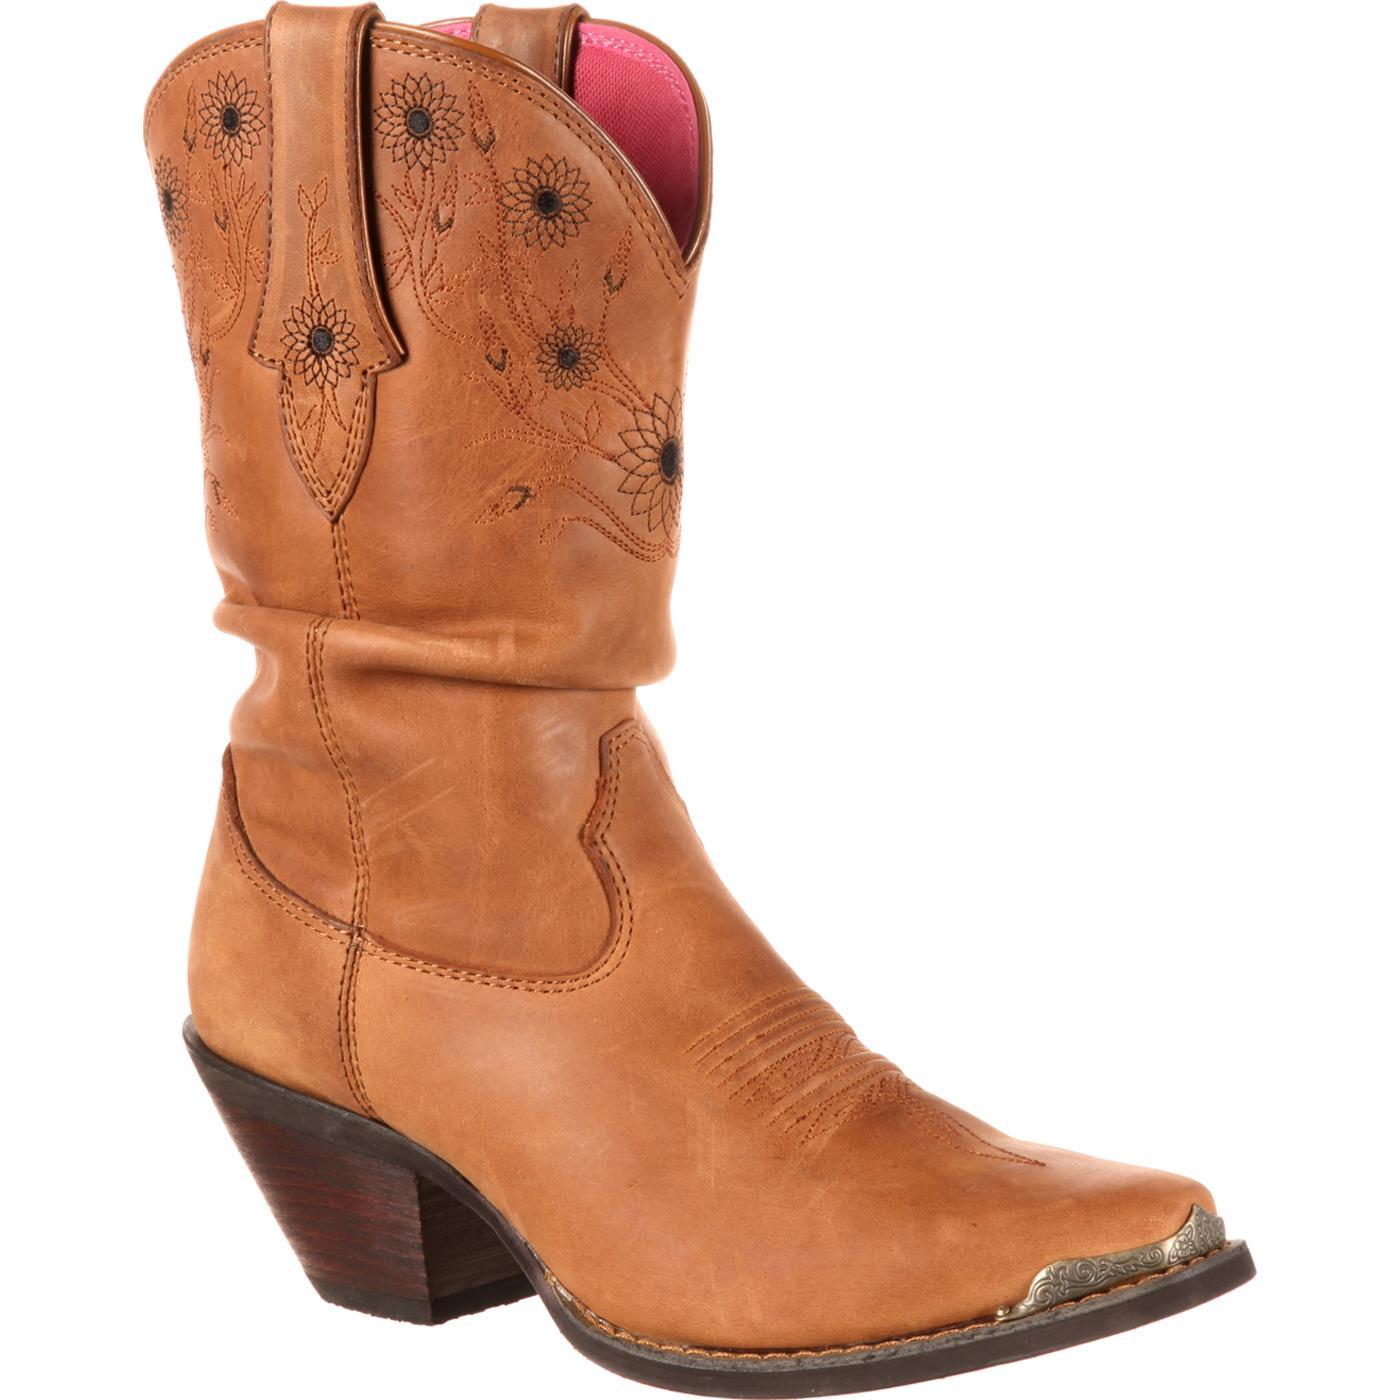 bbc7e04ebae Crush by Durango Women's Sarah Darling Sunflower Slouch Western Boot